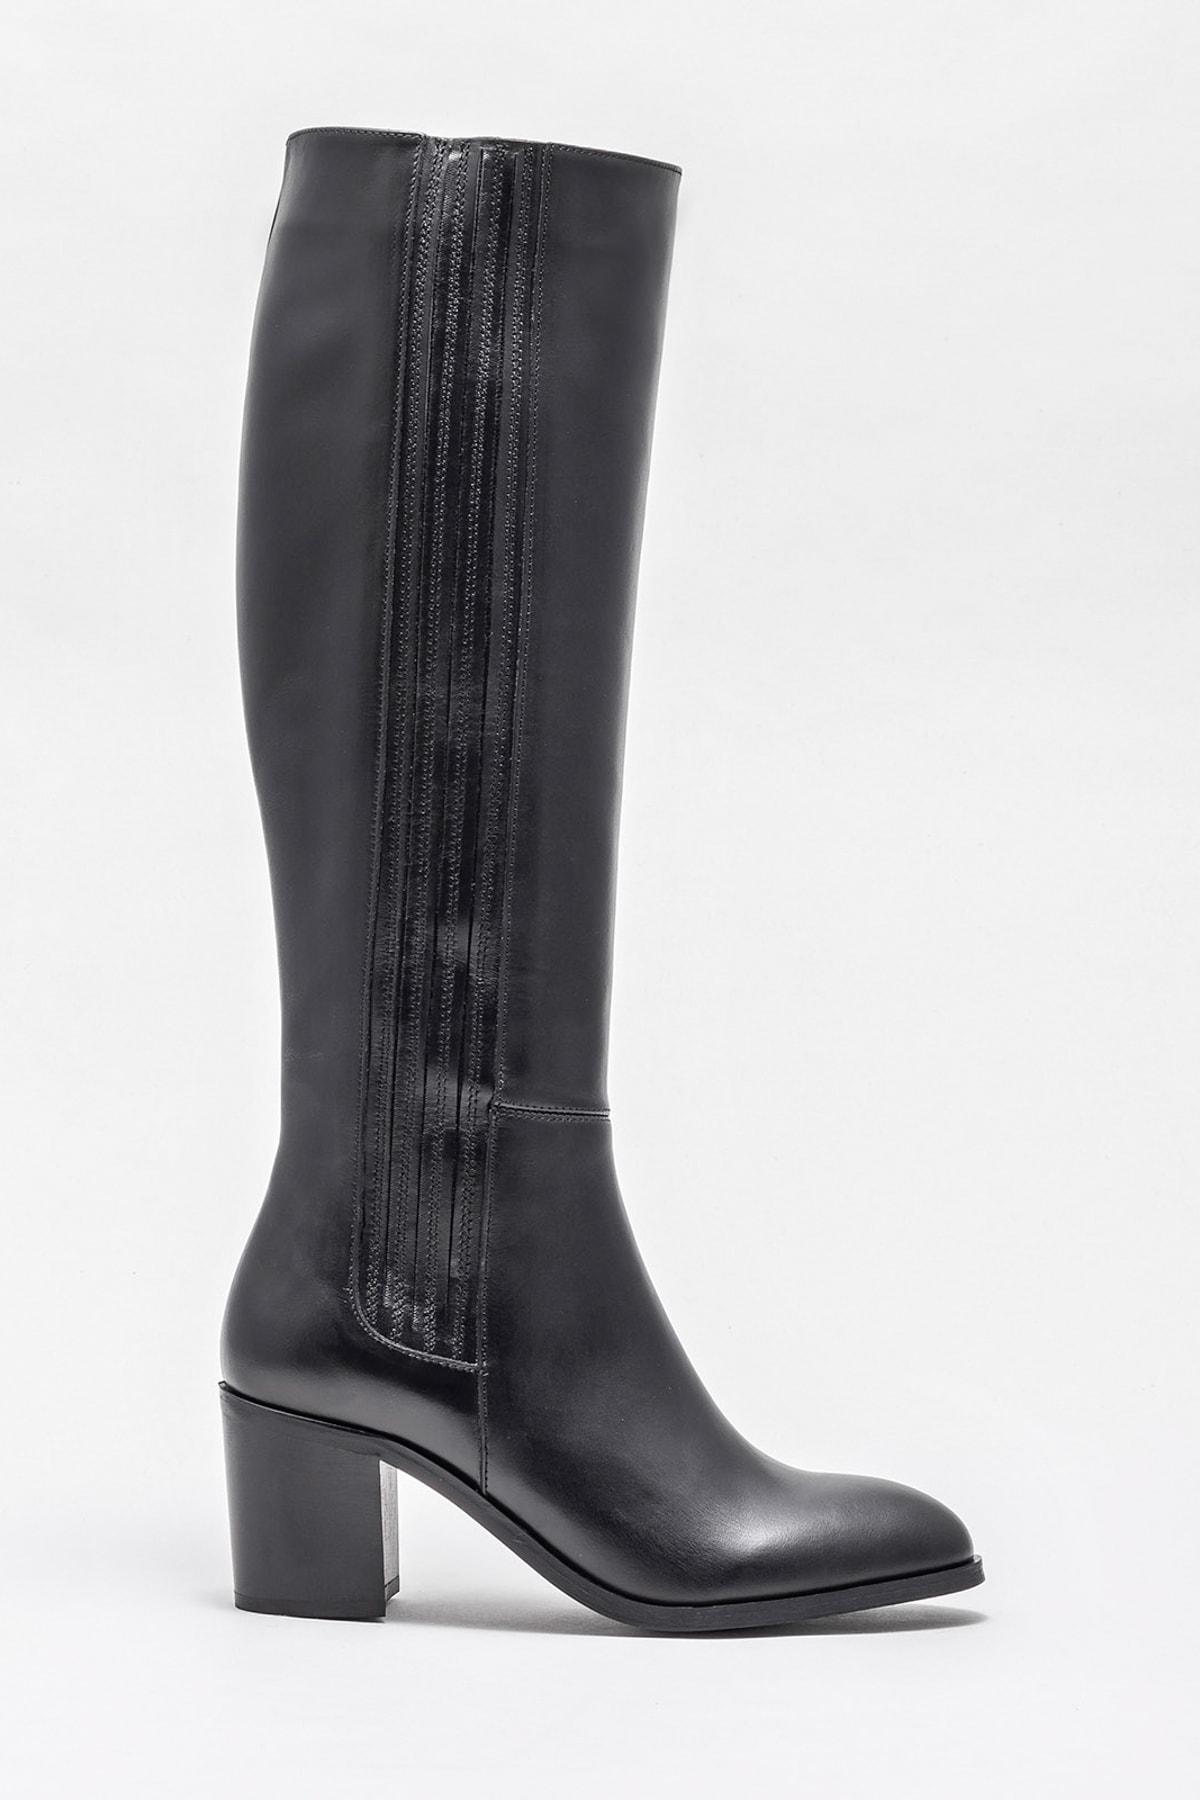 Elle Shoes Kadın RENIE-1 Çizme 20K012 1